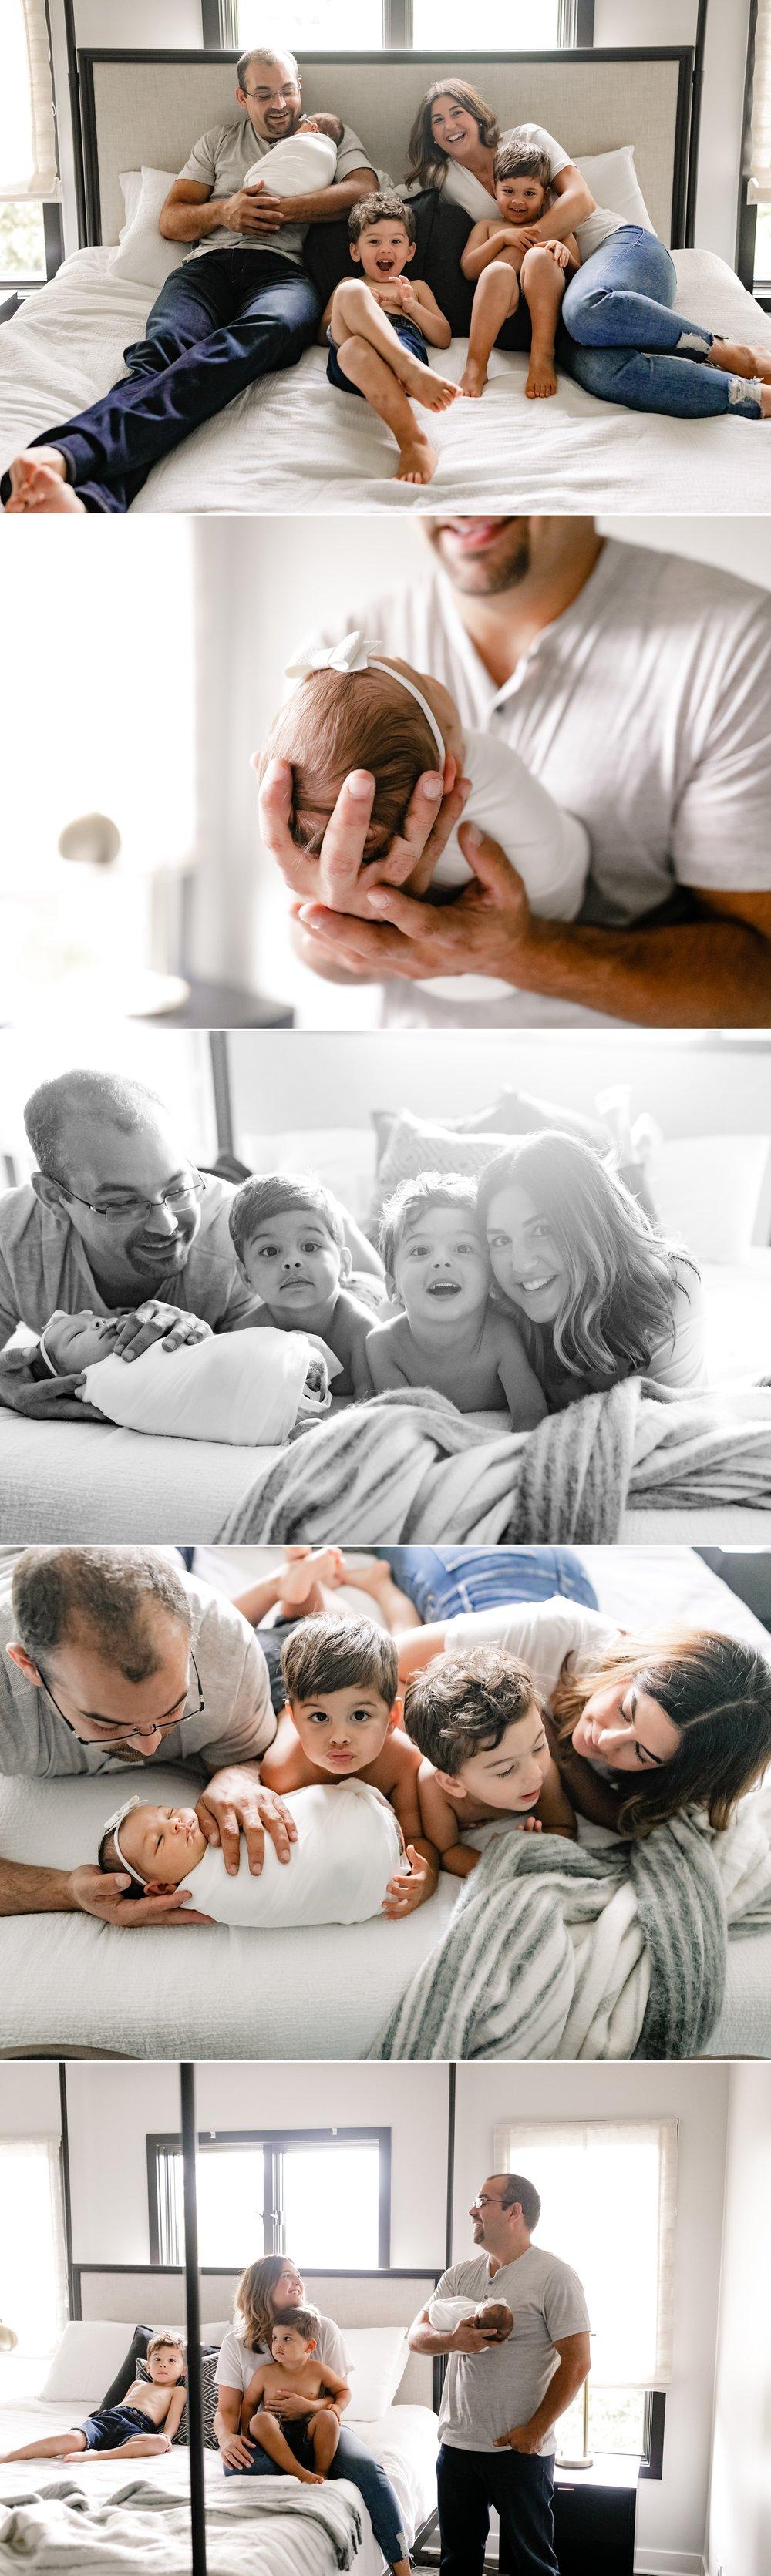 chicago newborn lifestyle family photography session jenny grimm photographer